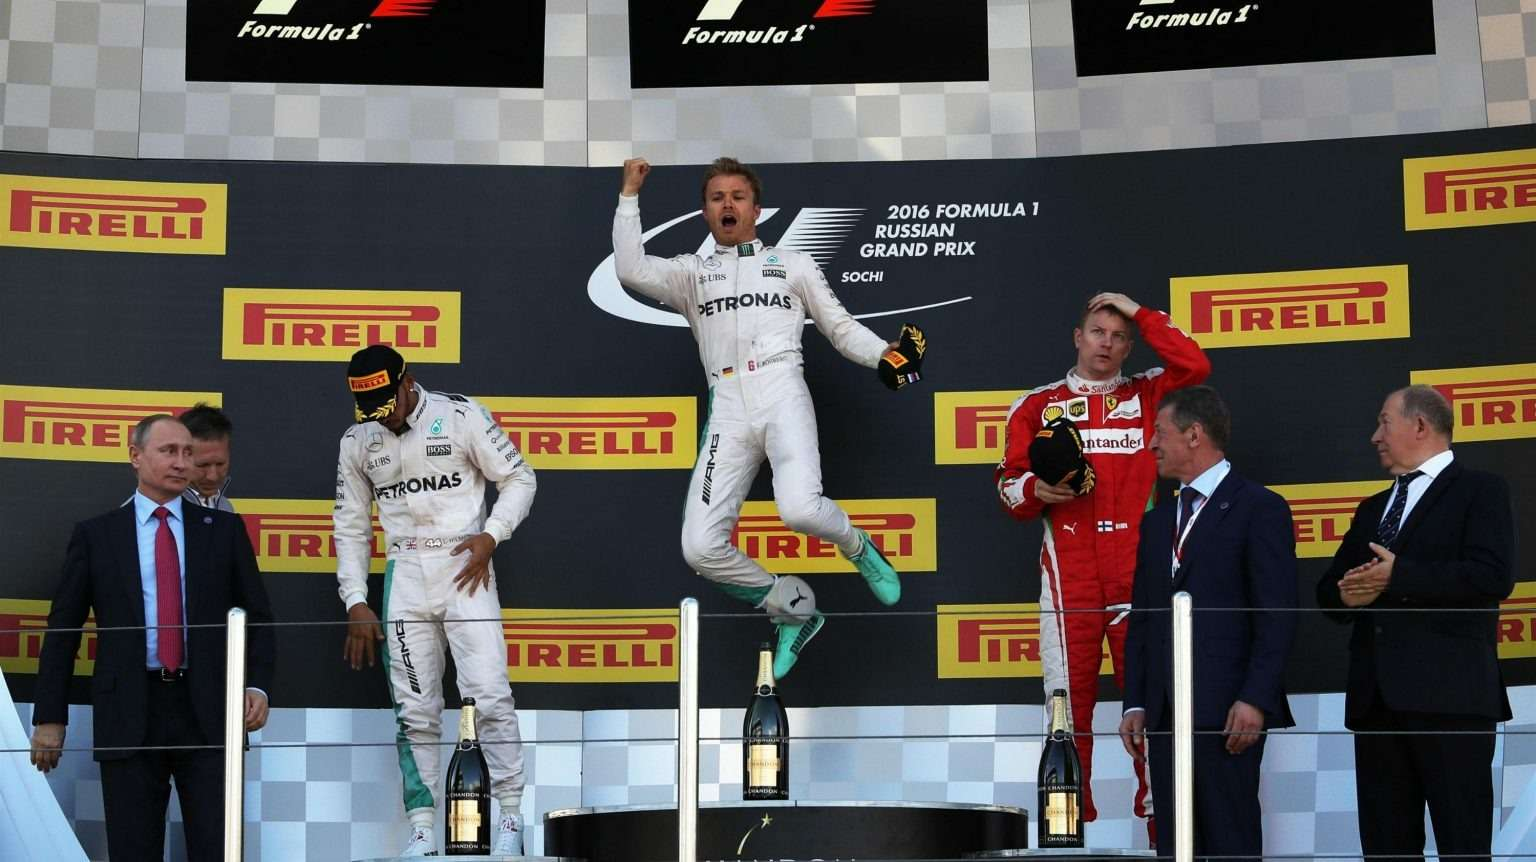 Формула 1, Сочи, Гран При России, Сочи Автодром